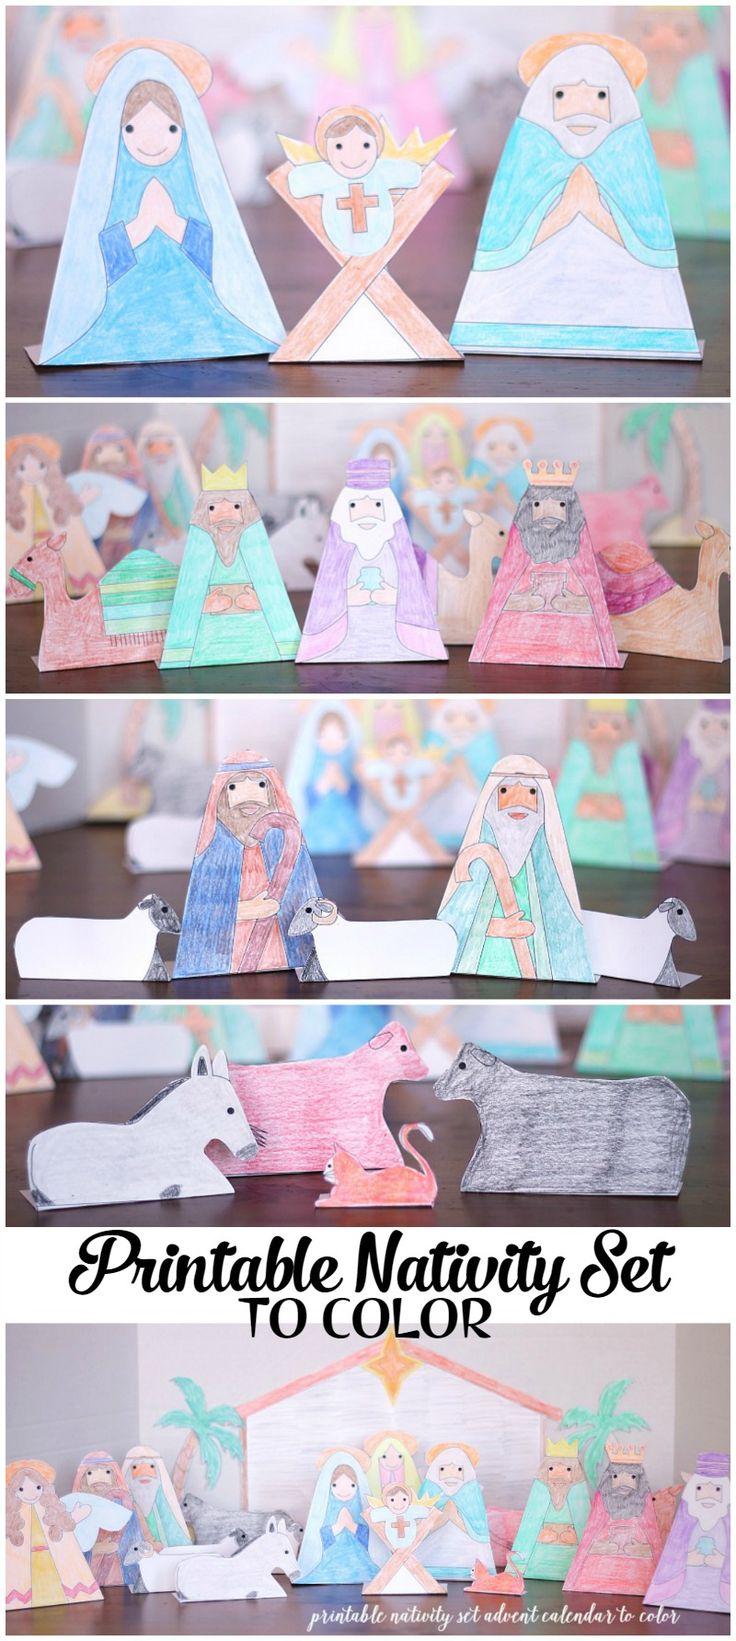 Nativity Advent Calendar to Print and Color